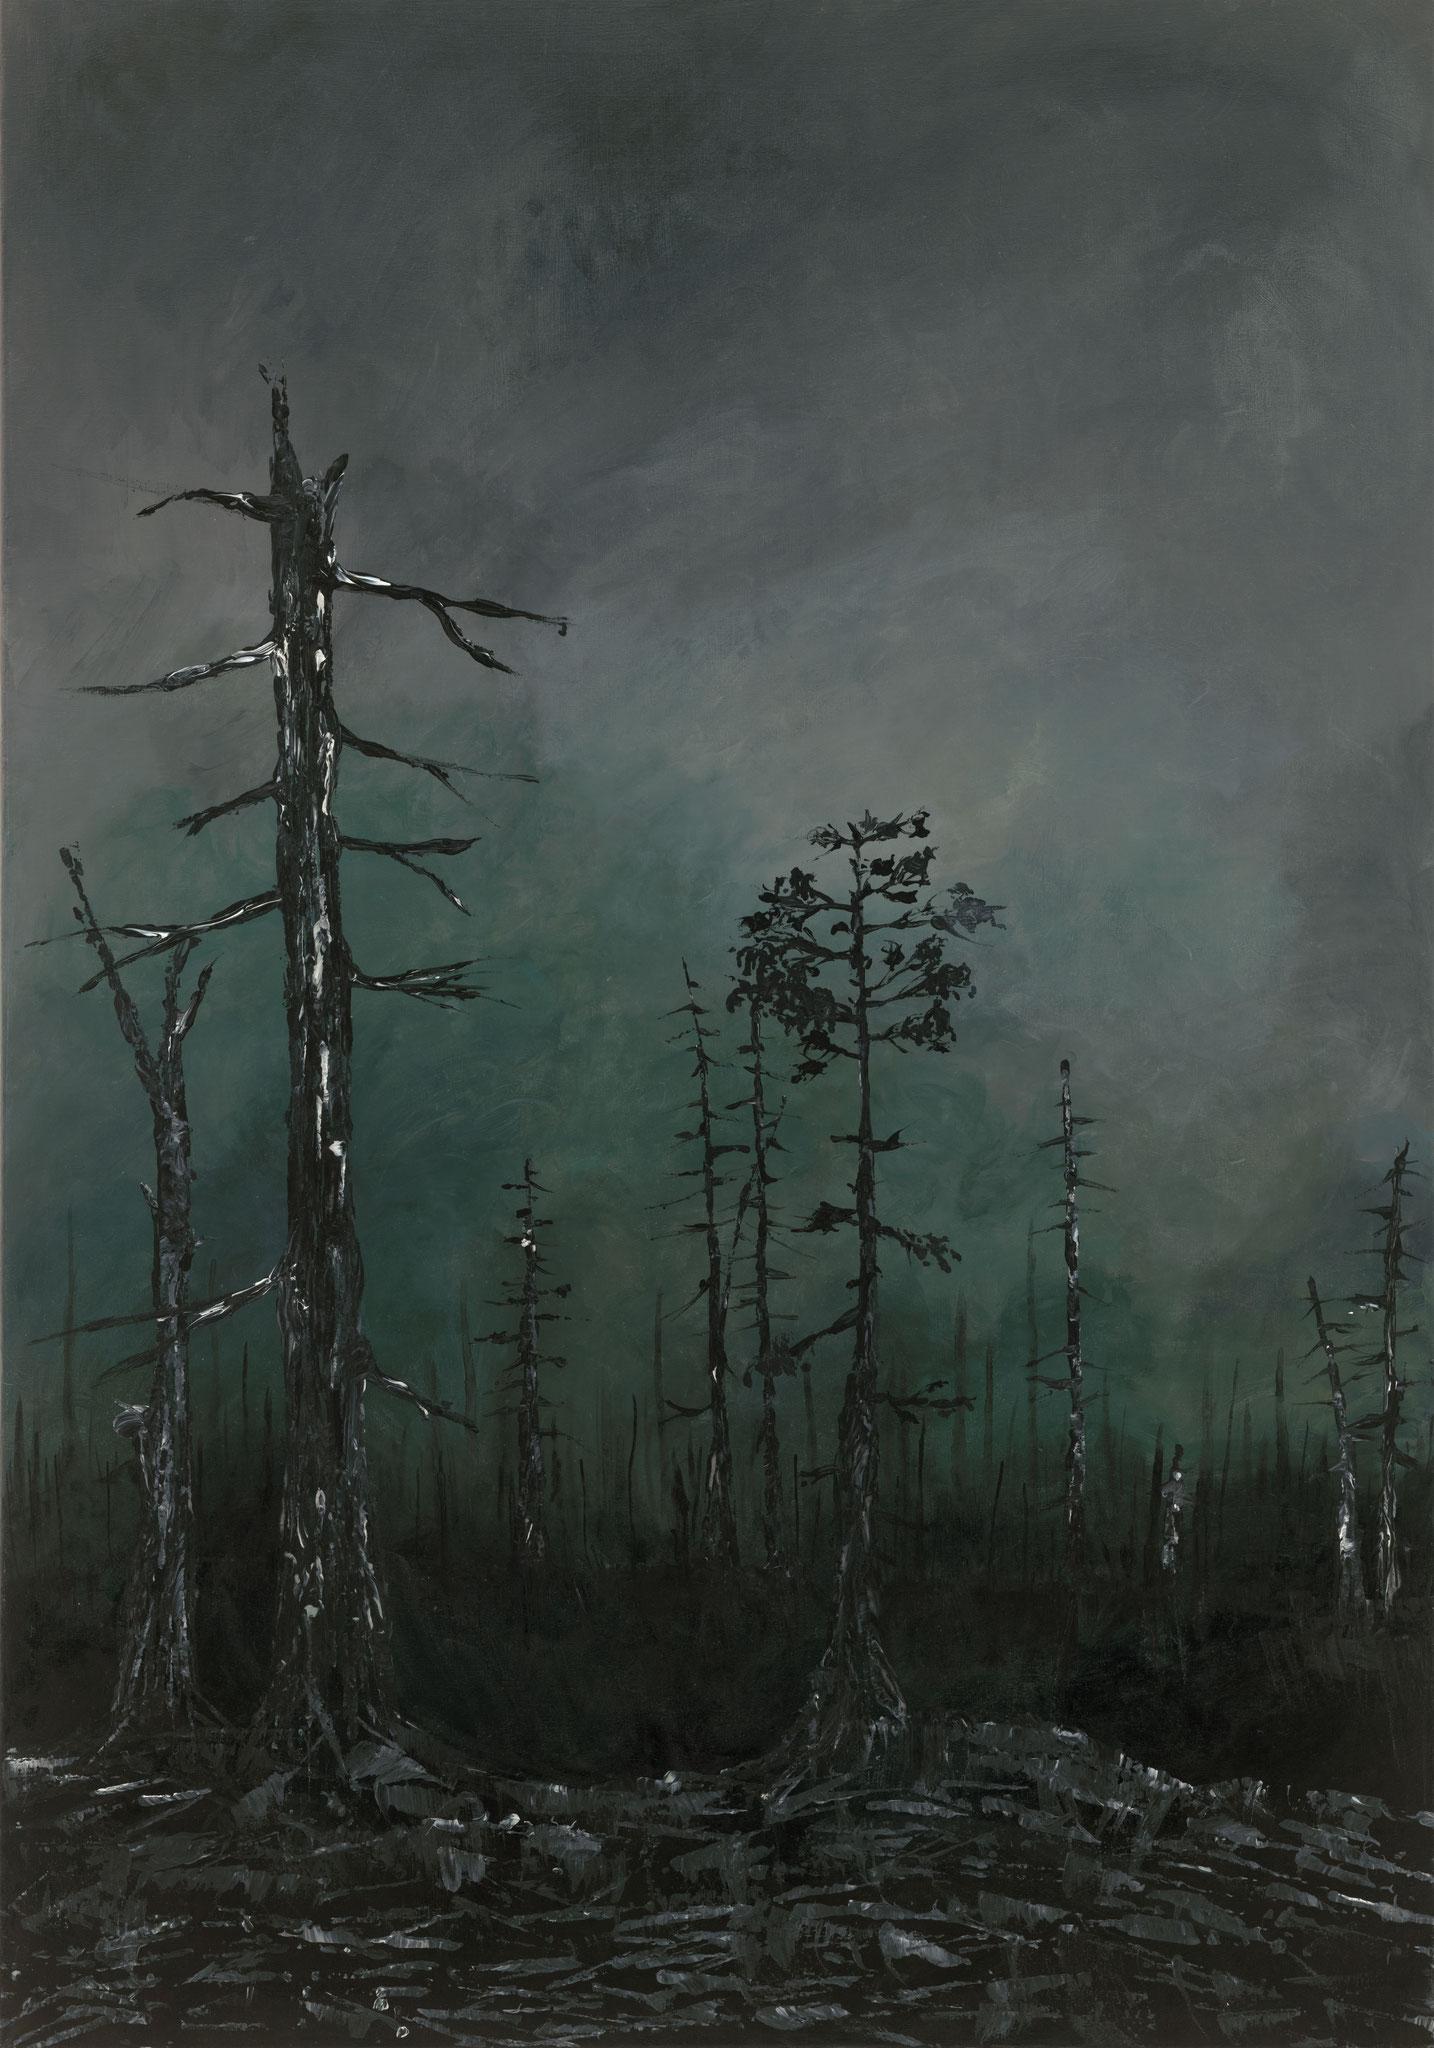 Grüner Horizont (2018). 100 cm x 70 cm.